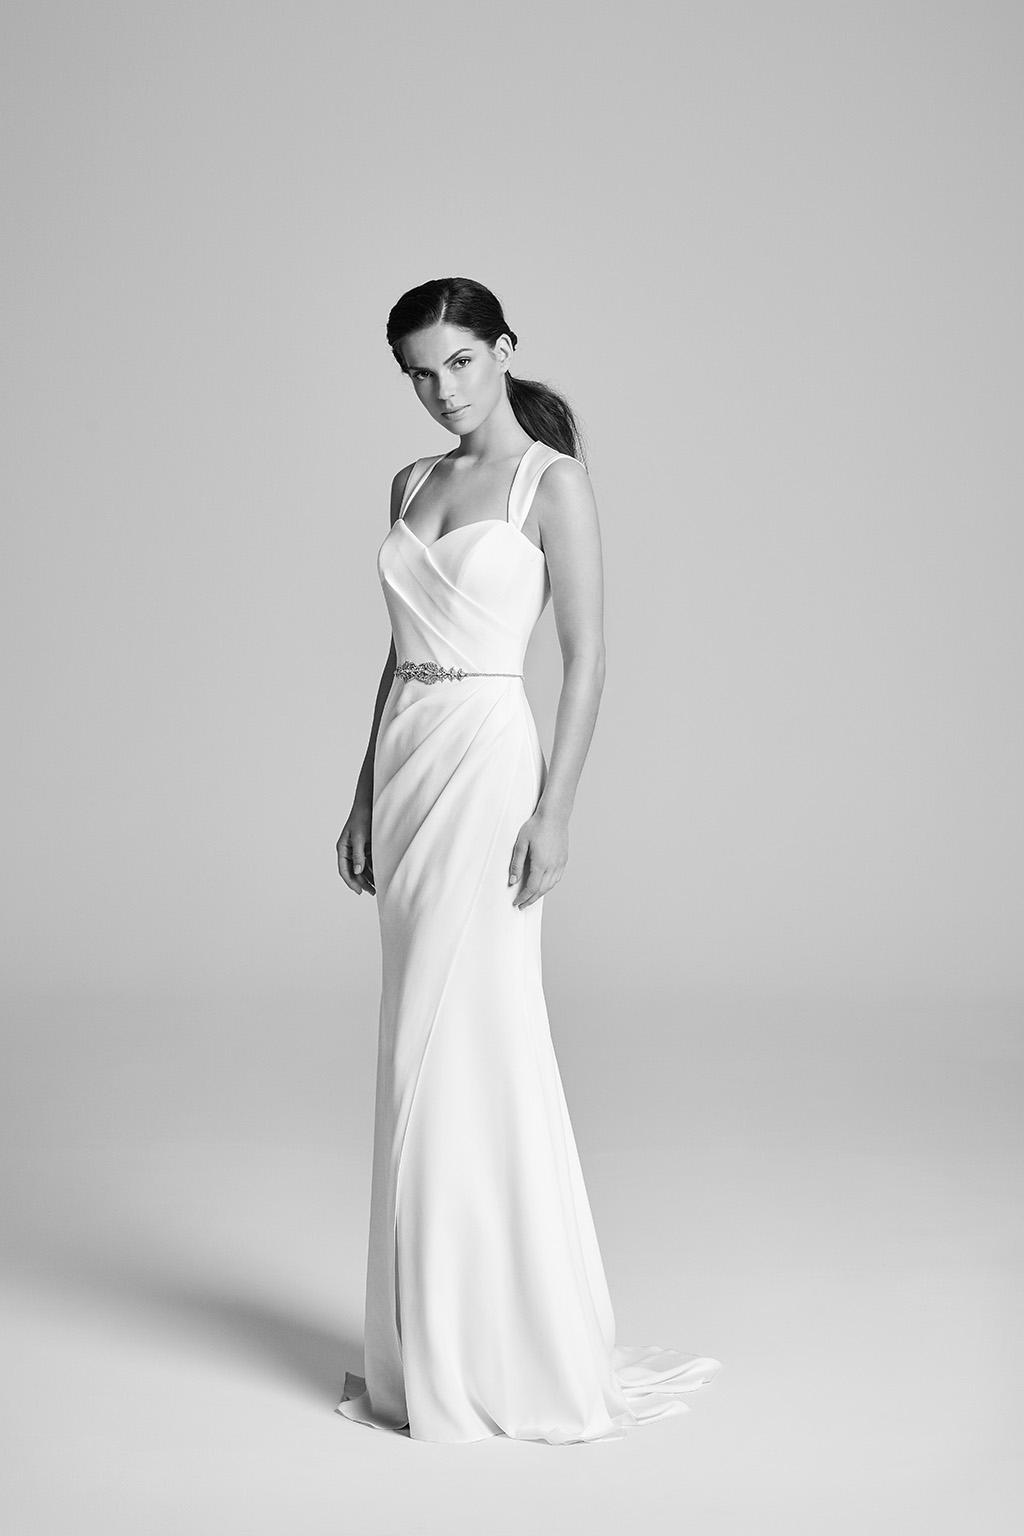 constance-bridalcouture-wedding-dresses-uk-belle-epoque-collection-2018-by-designer-suzanne-neville